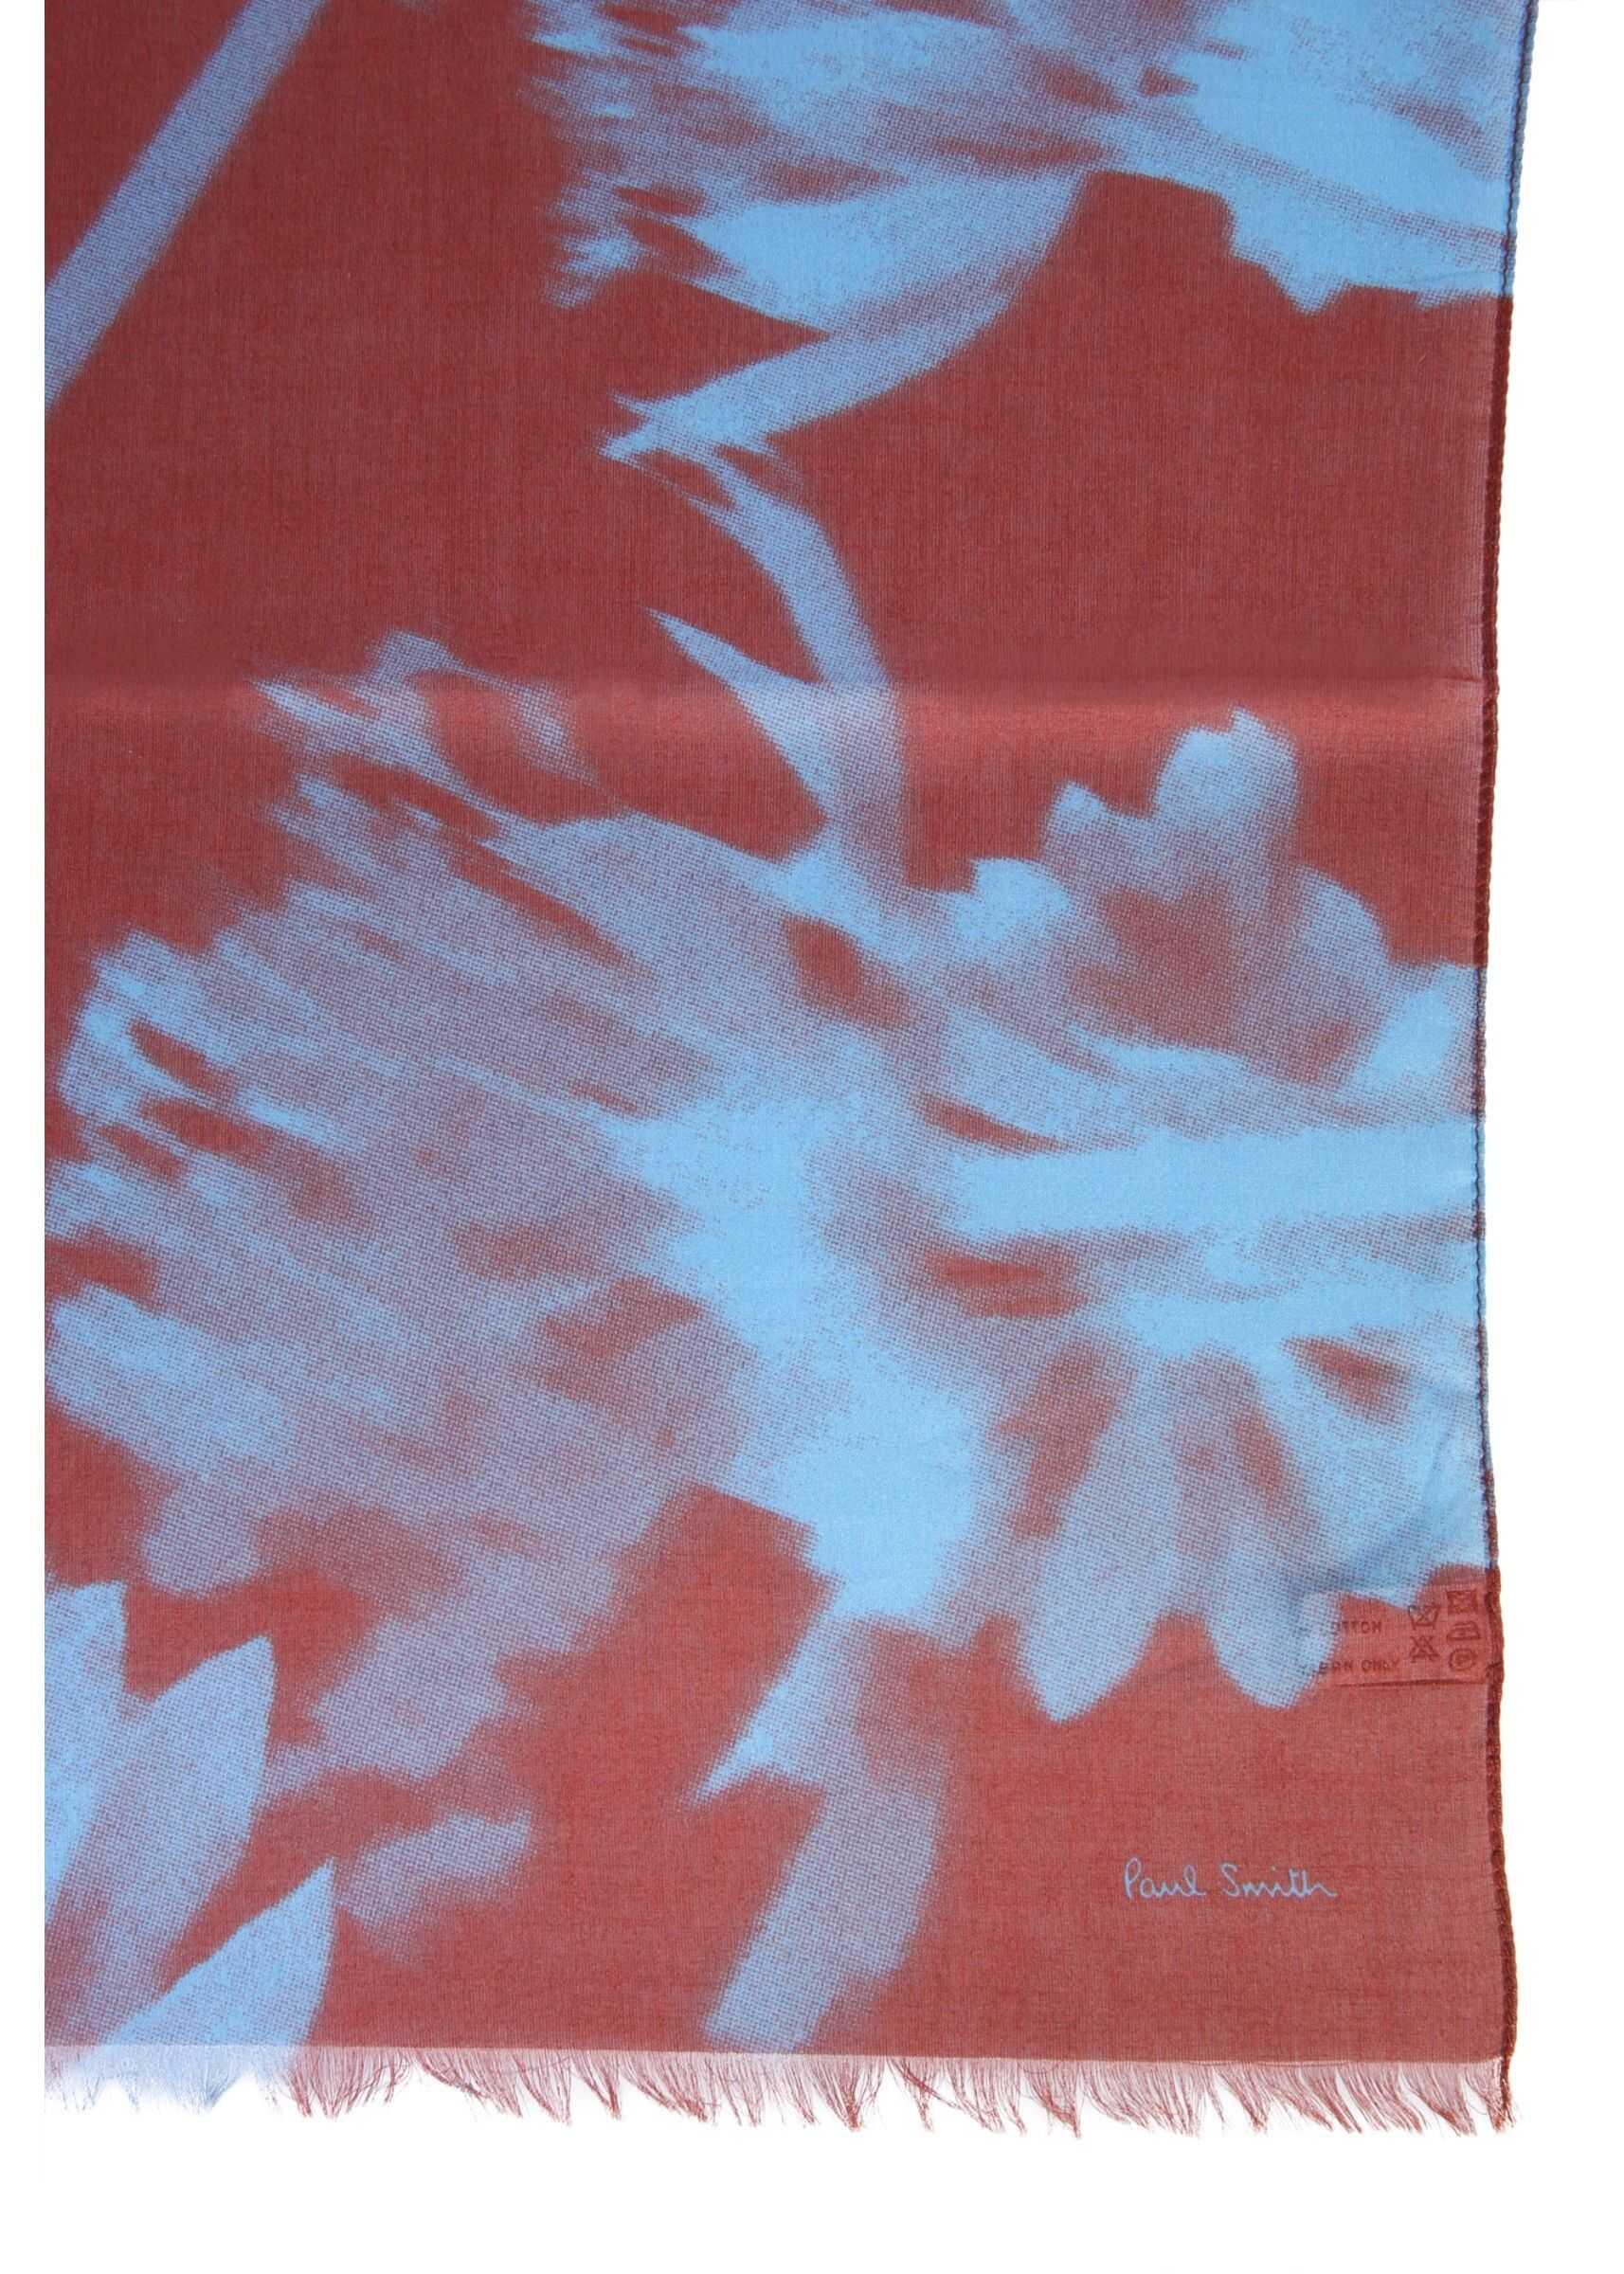 Paul Smith Floral Print Scarf ORANGE